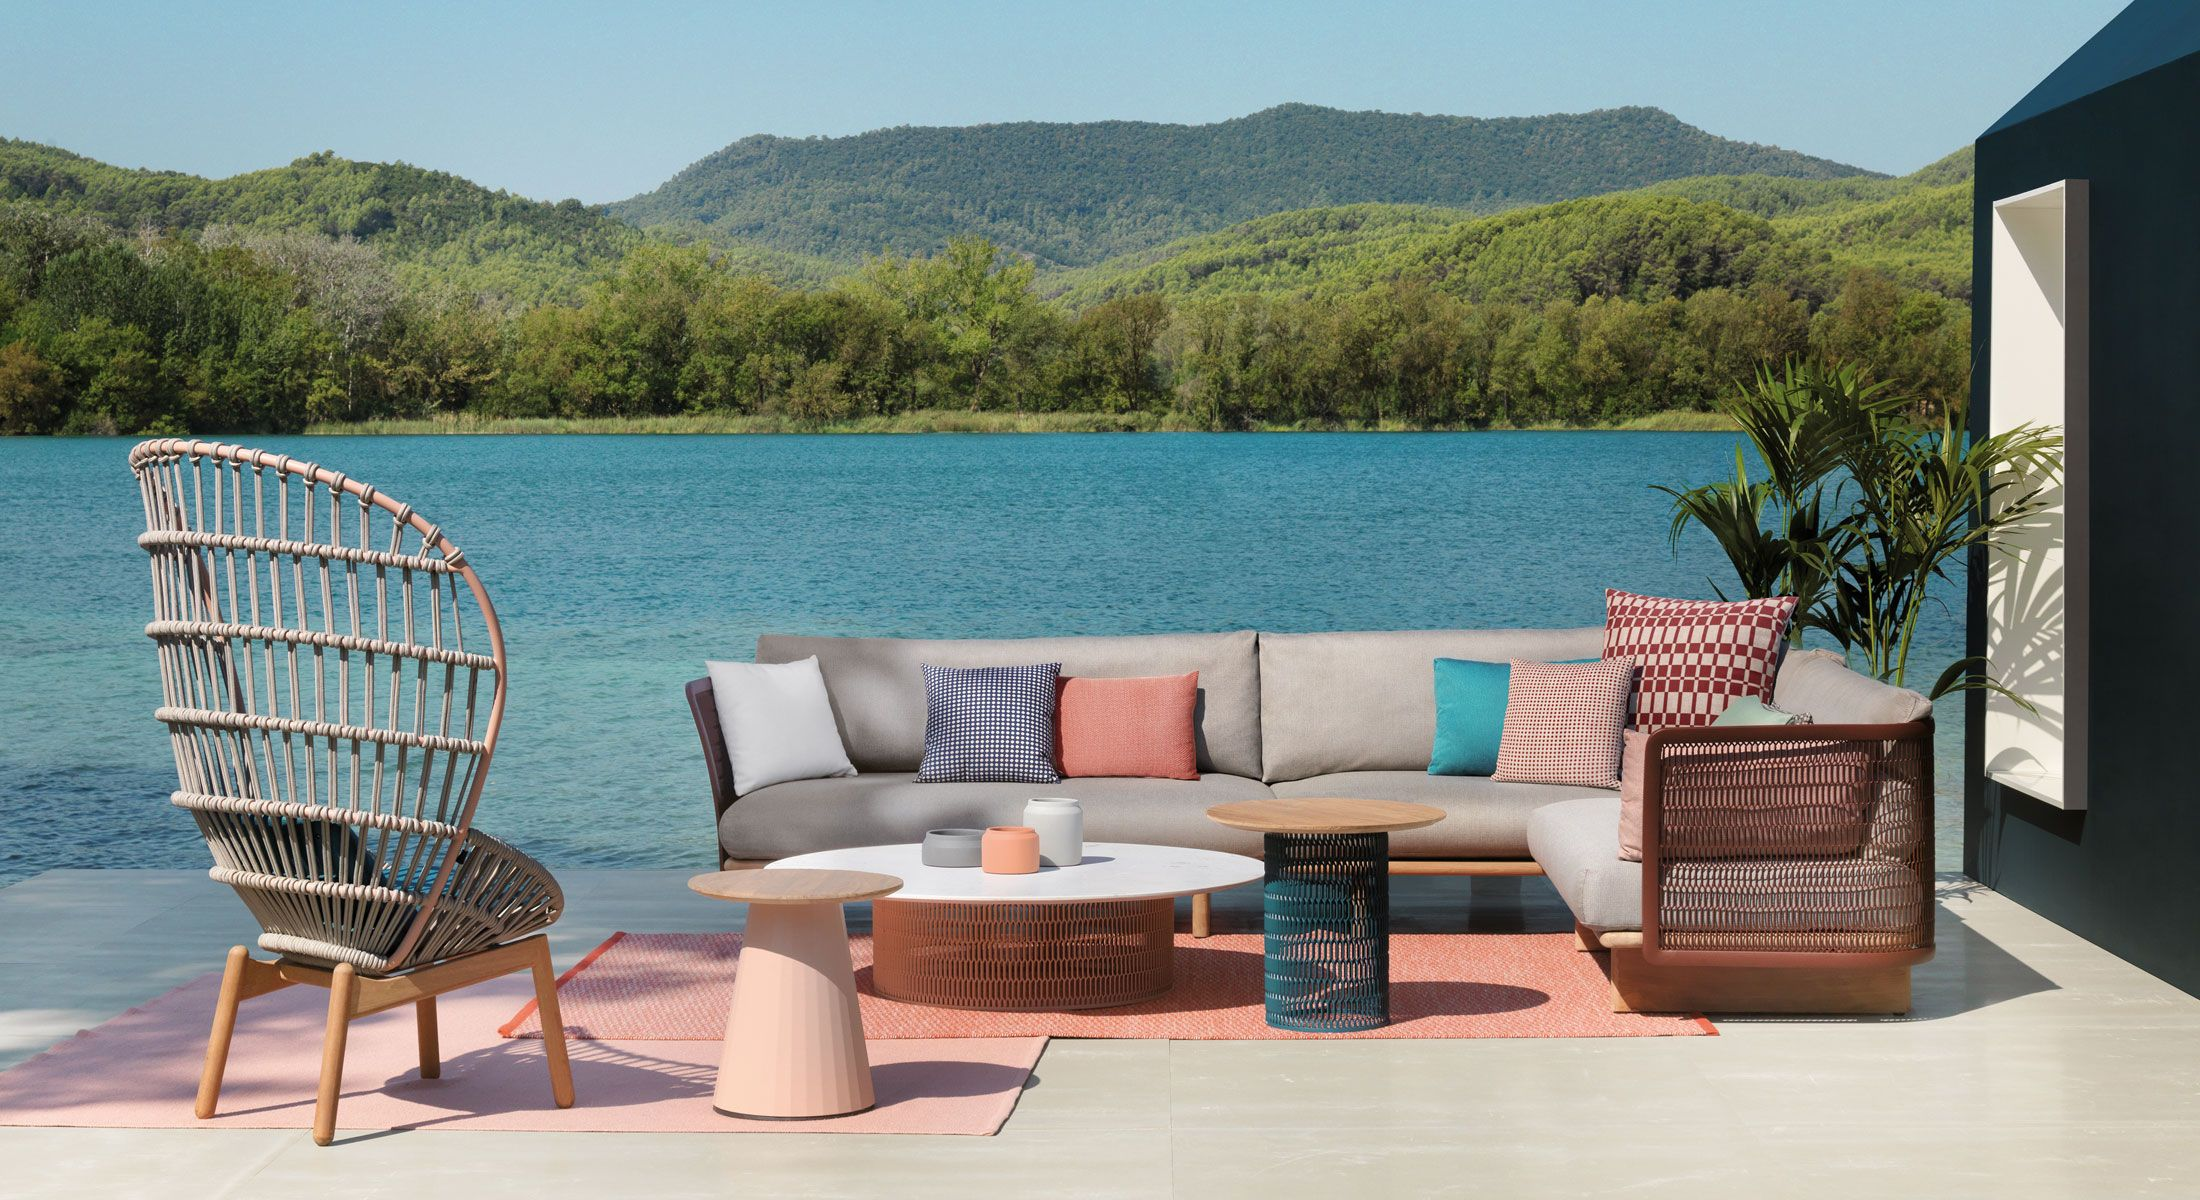 Kettal Luxury Outdoor Furniture Luxury Outdoor Furniture Outdoor Furniture Australia Timeless Furniture